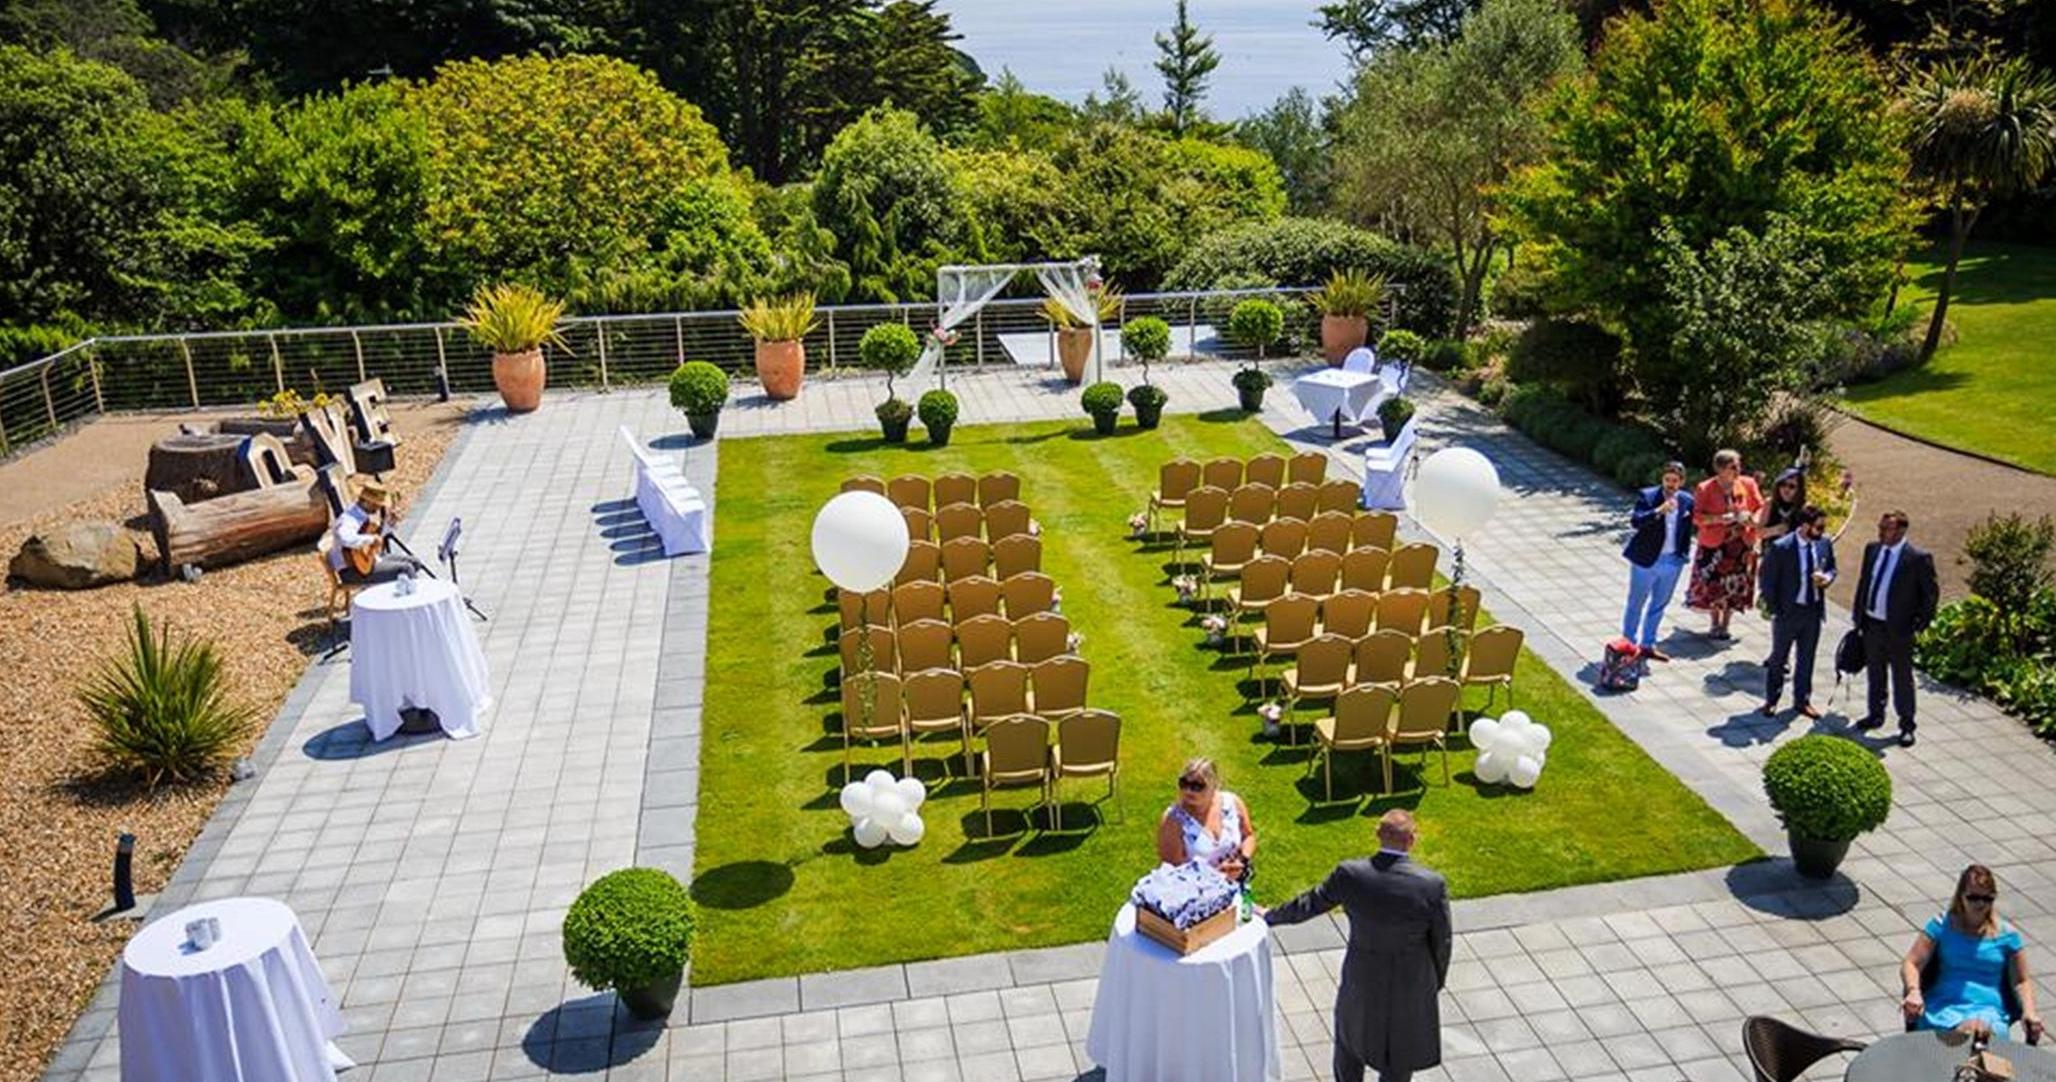 Photograph by Evoke Wedding Photography